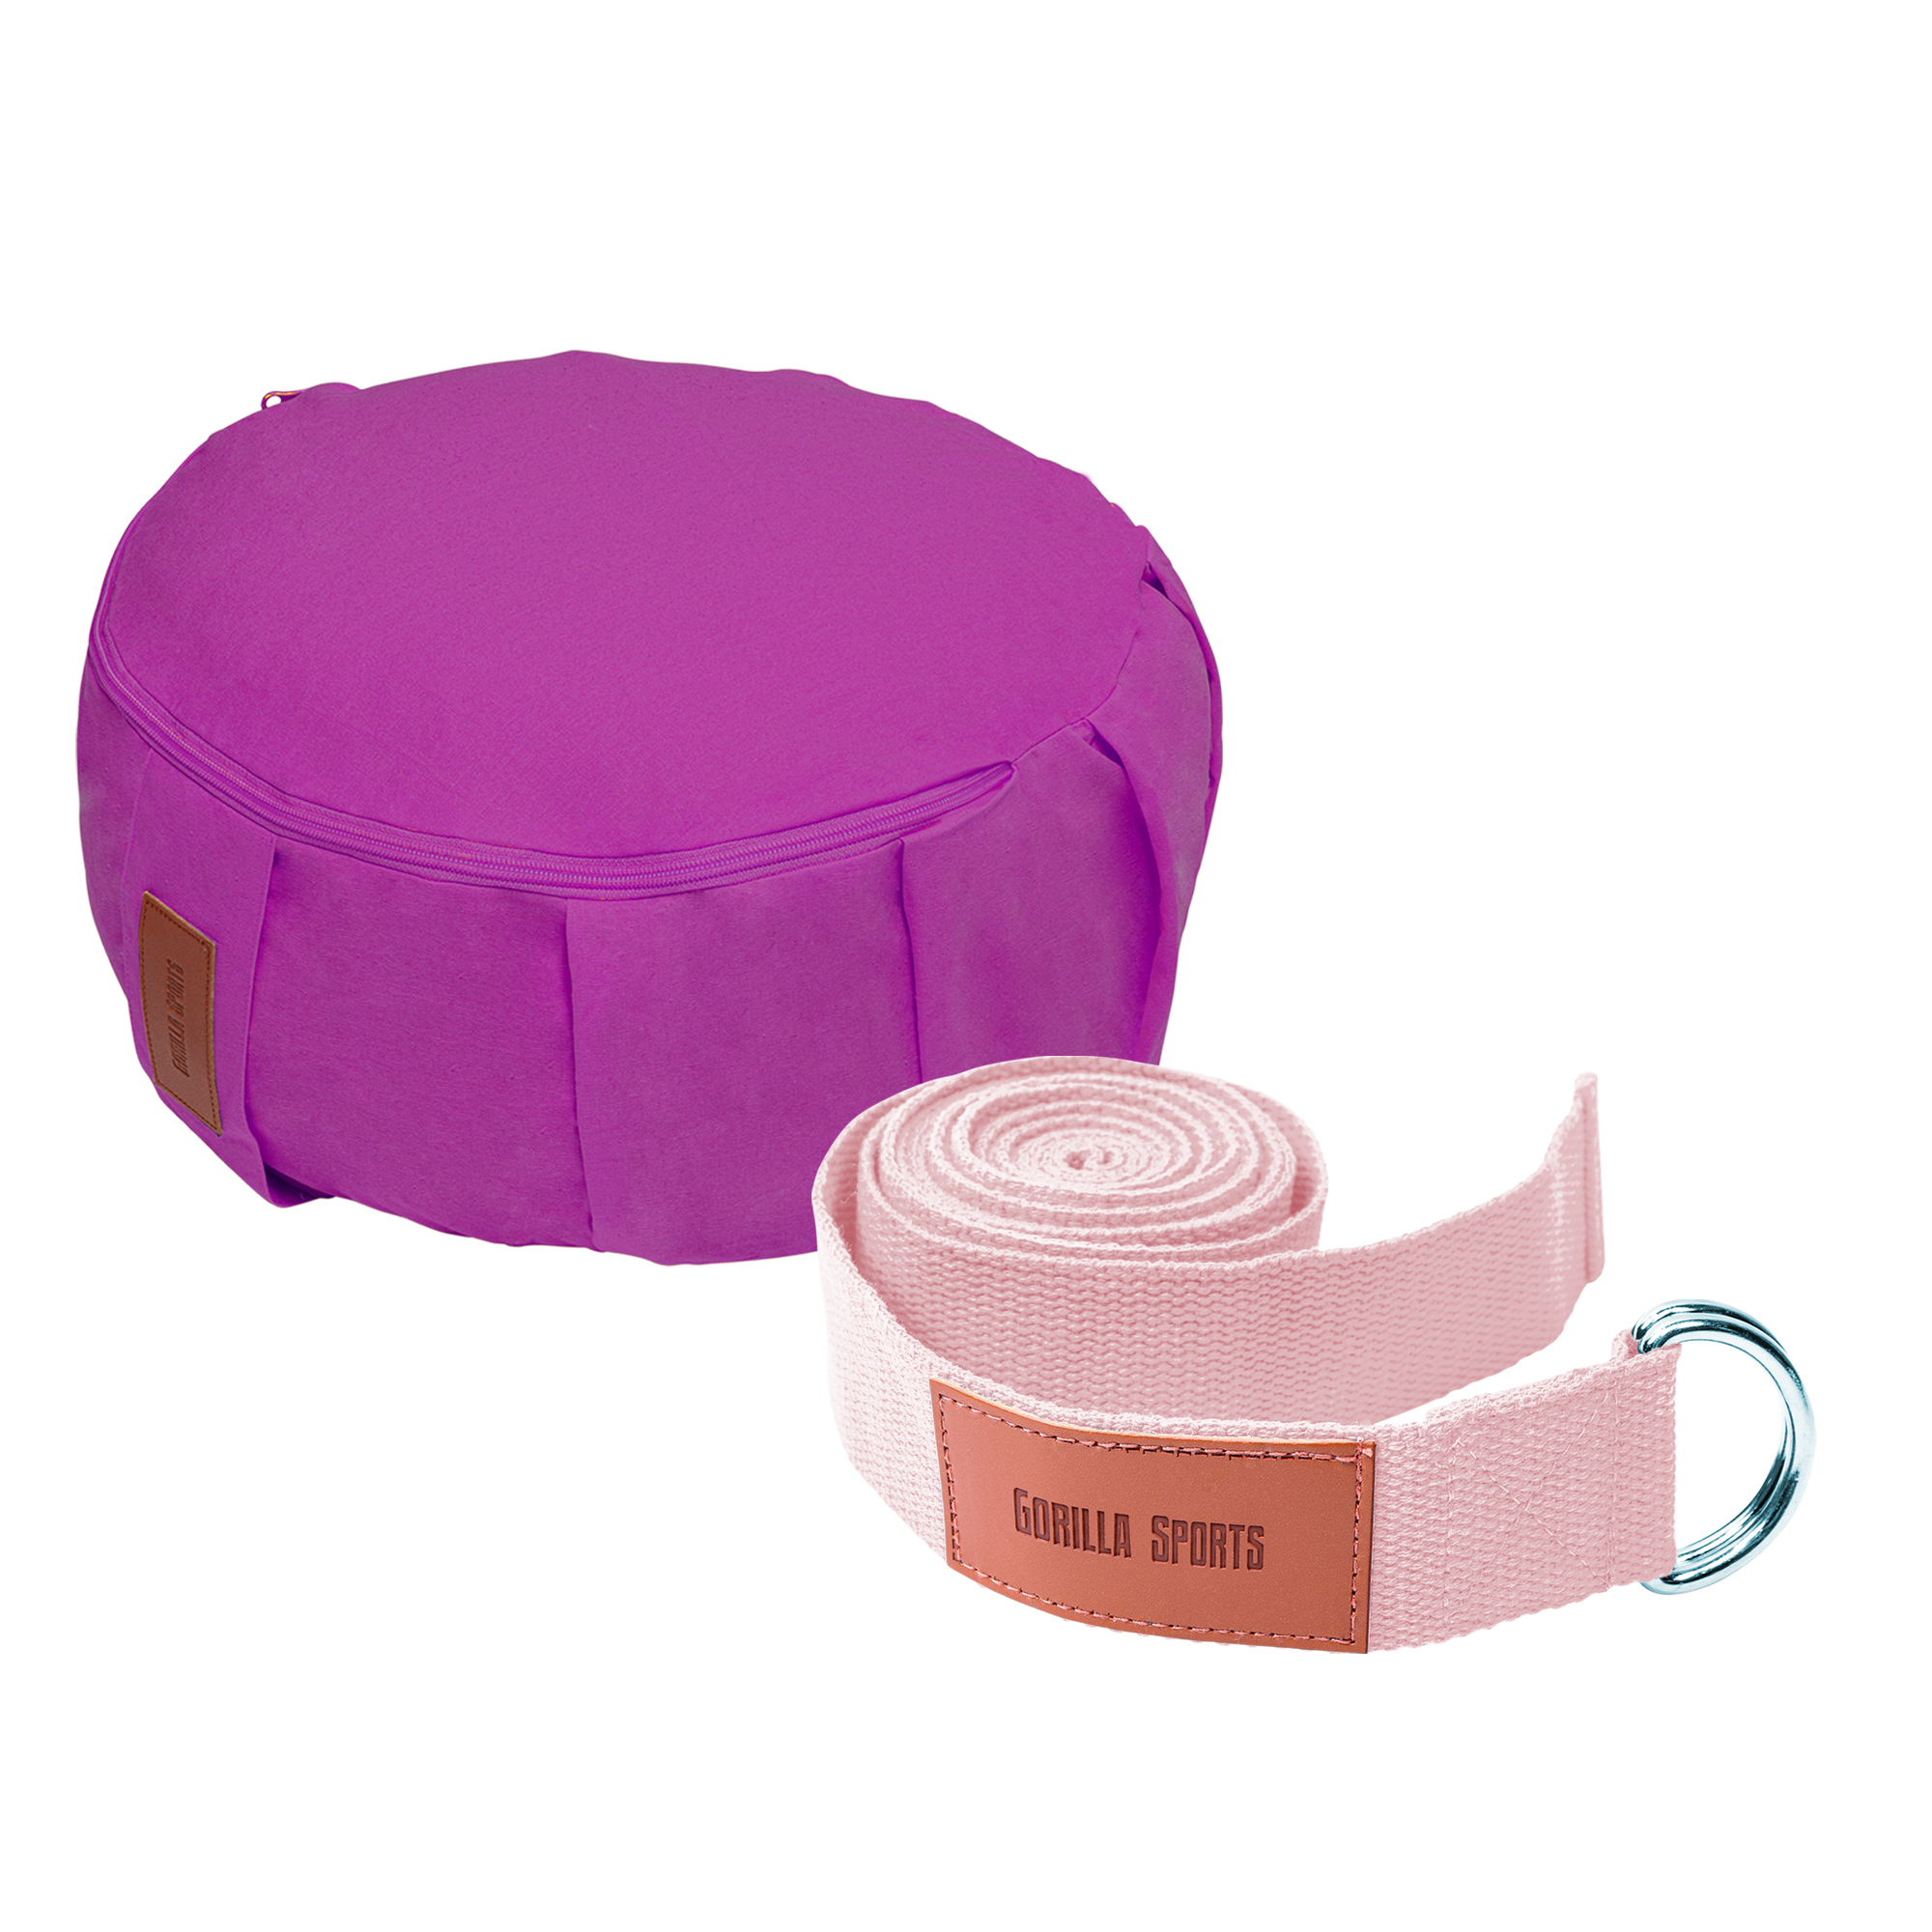 Gorilla Sports Yoga Set Lila/Pink inkl. Yogakissen und Yogagurt 101133-00040-0001